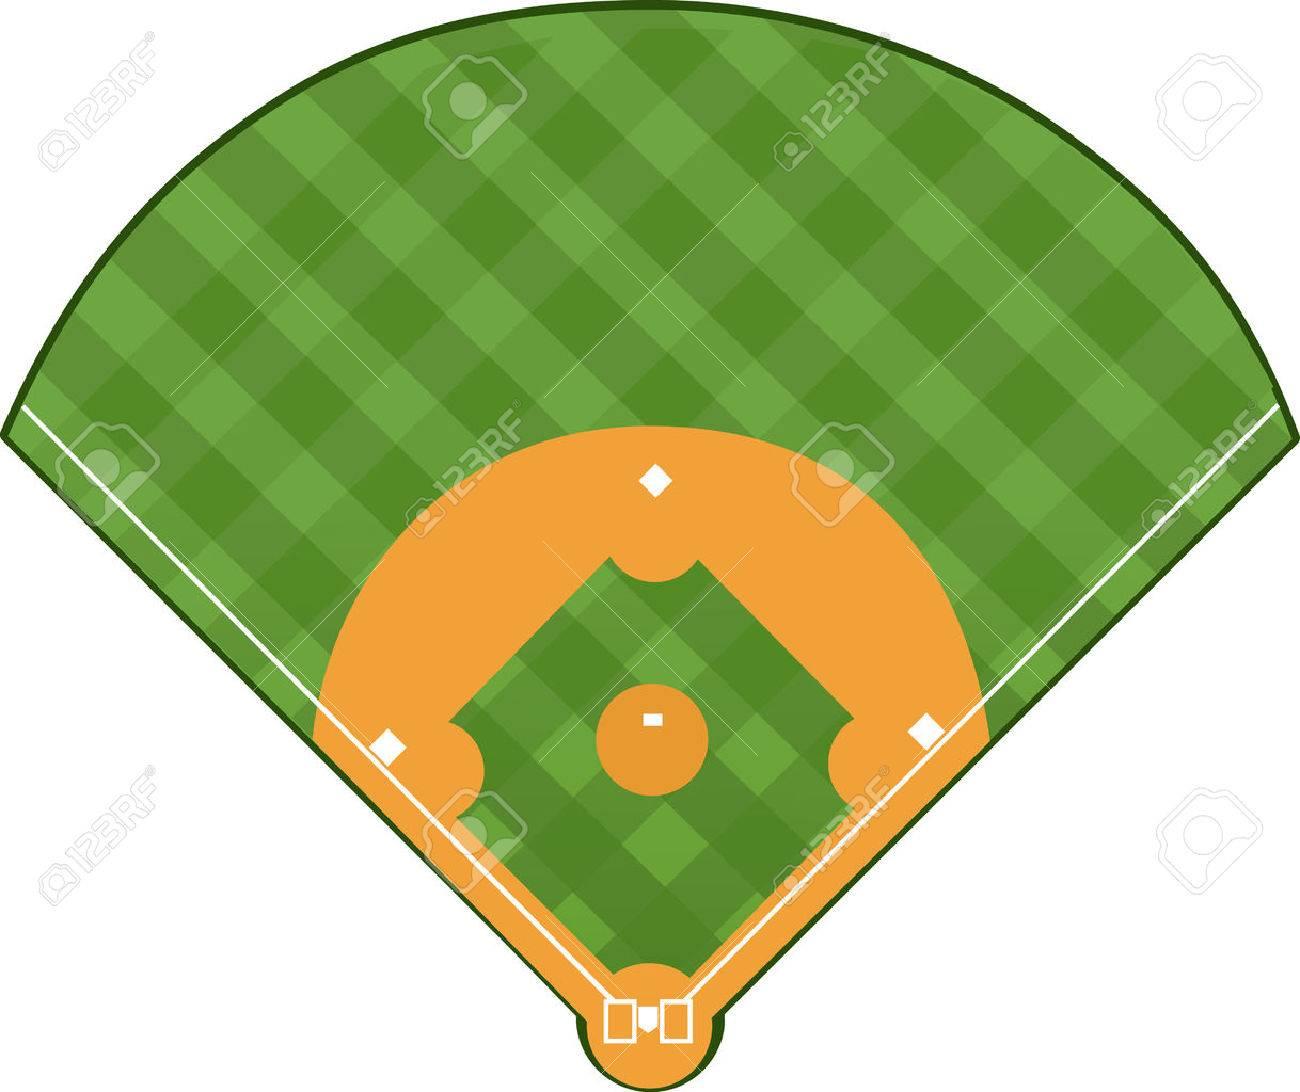 baseball field royalty free cliparts vectors and stock rh 123rf com baseball diamond vector free